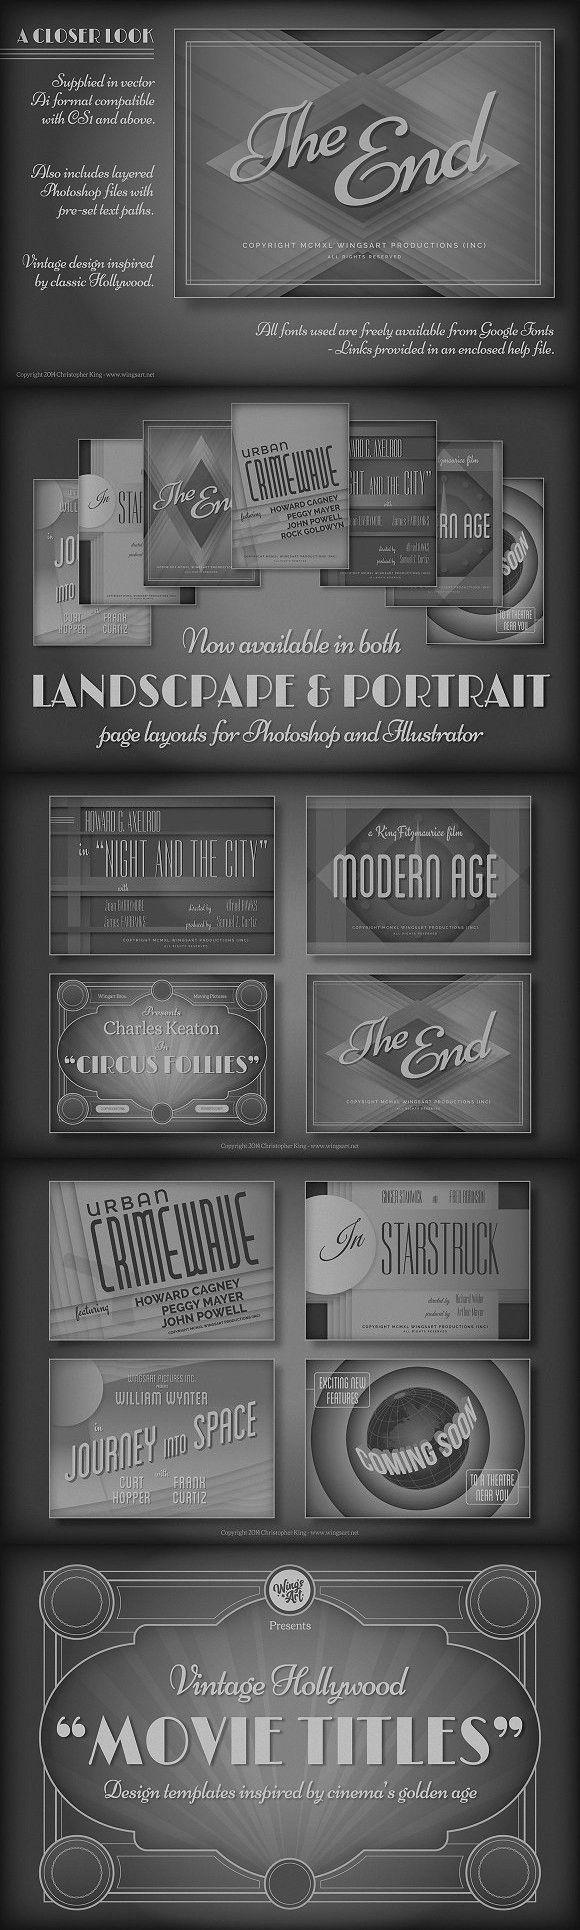 Vintage Hollywood Movie Titles Movie titles, Vintage